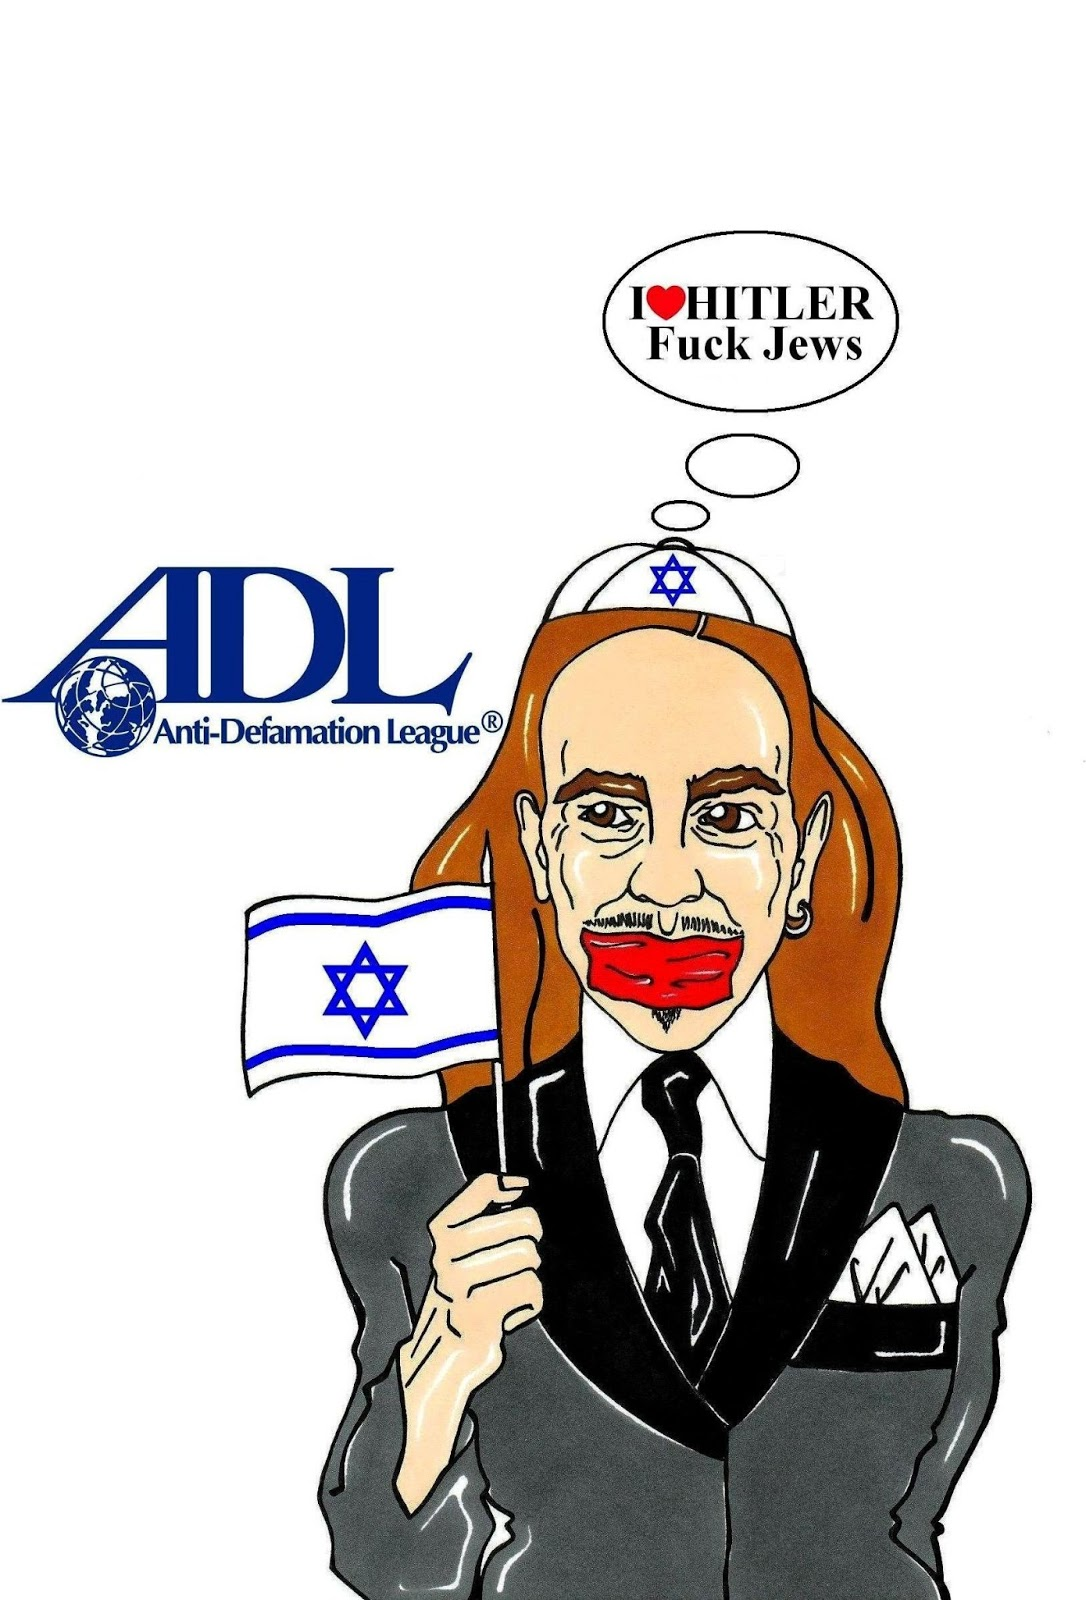 http://2.bp.blogspot.com/-coUIuMAEf4s/UPwfKFDV0WI/AAAAAAAAKEE/1CuXnbK7FYc/s1600/John+Galliano+testimonial+for+ADL+Campaign+The+Anti-Defamation+League+I+LOVE+HITLER+Fuck+Jews+Oscar+de+la+Renta+Anna+Wintour++Humor+Chic+by+aleXsandro+Palombo.jpg